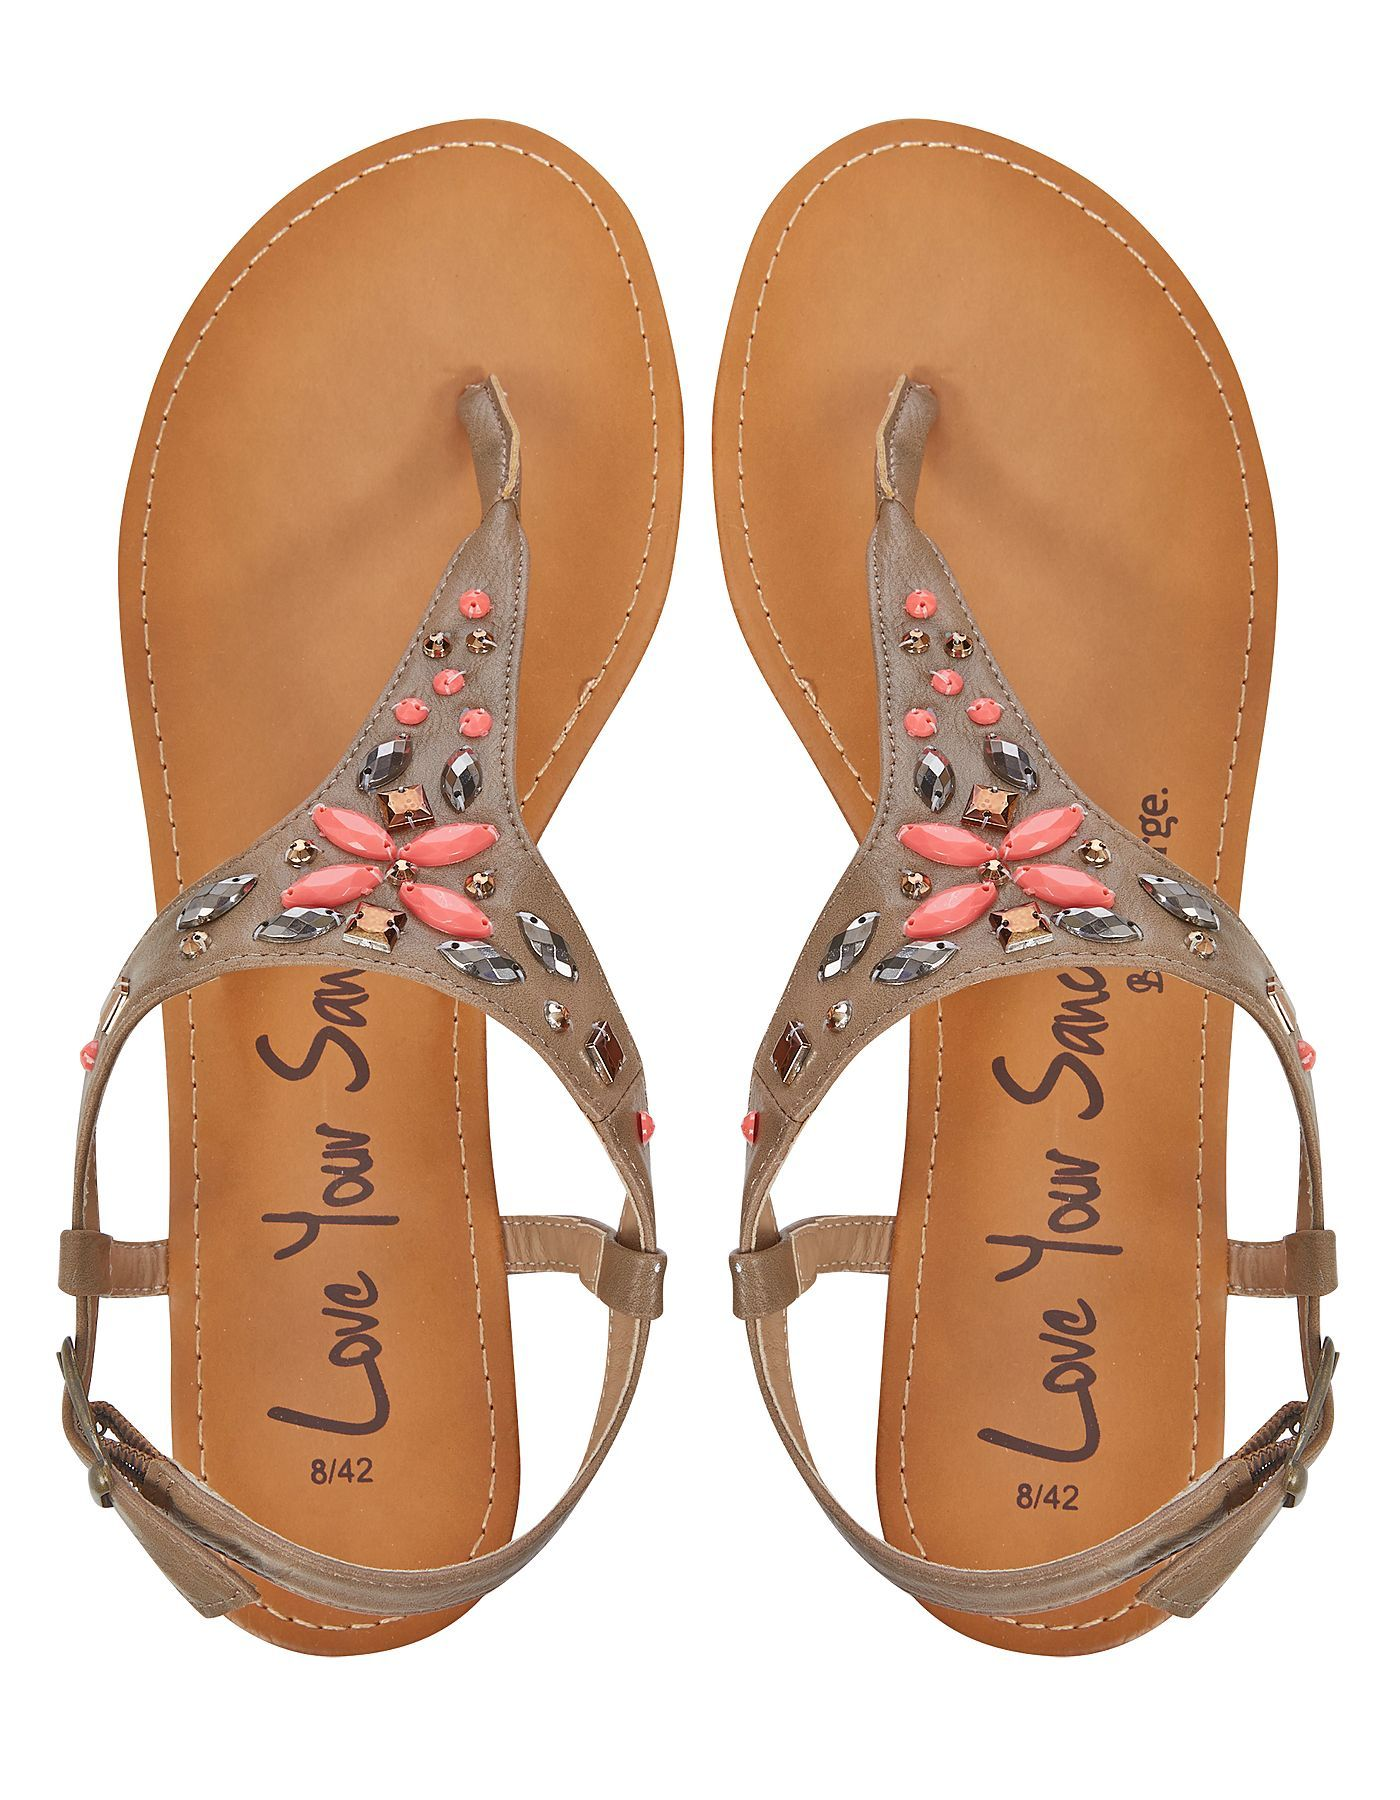 Jeweled sandals, Womens sandals, Asda